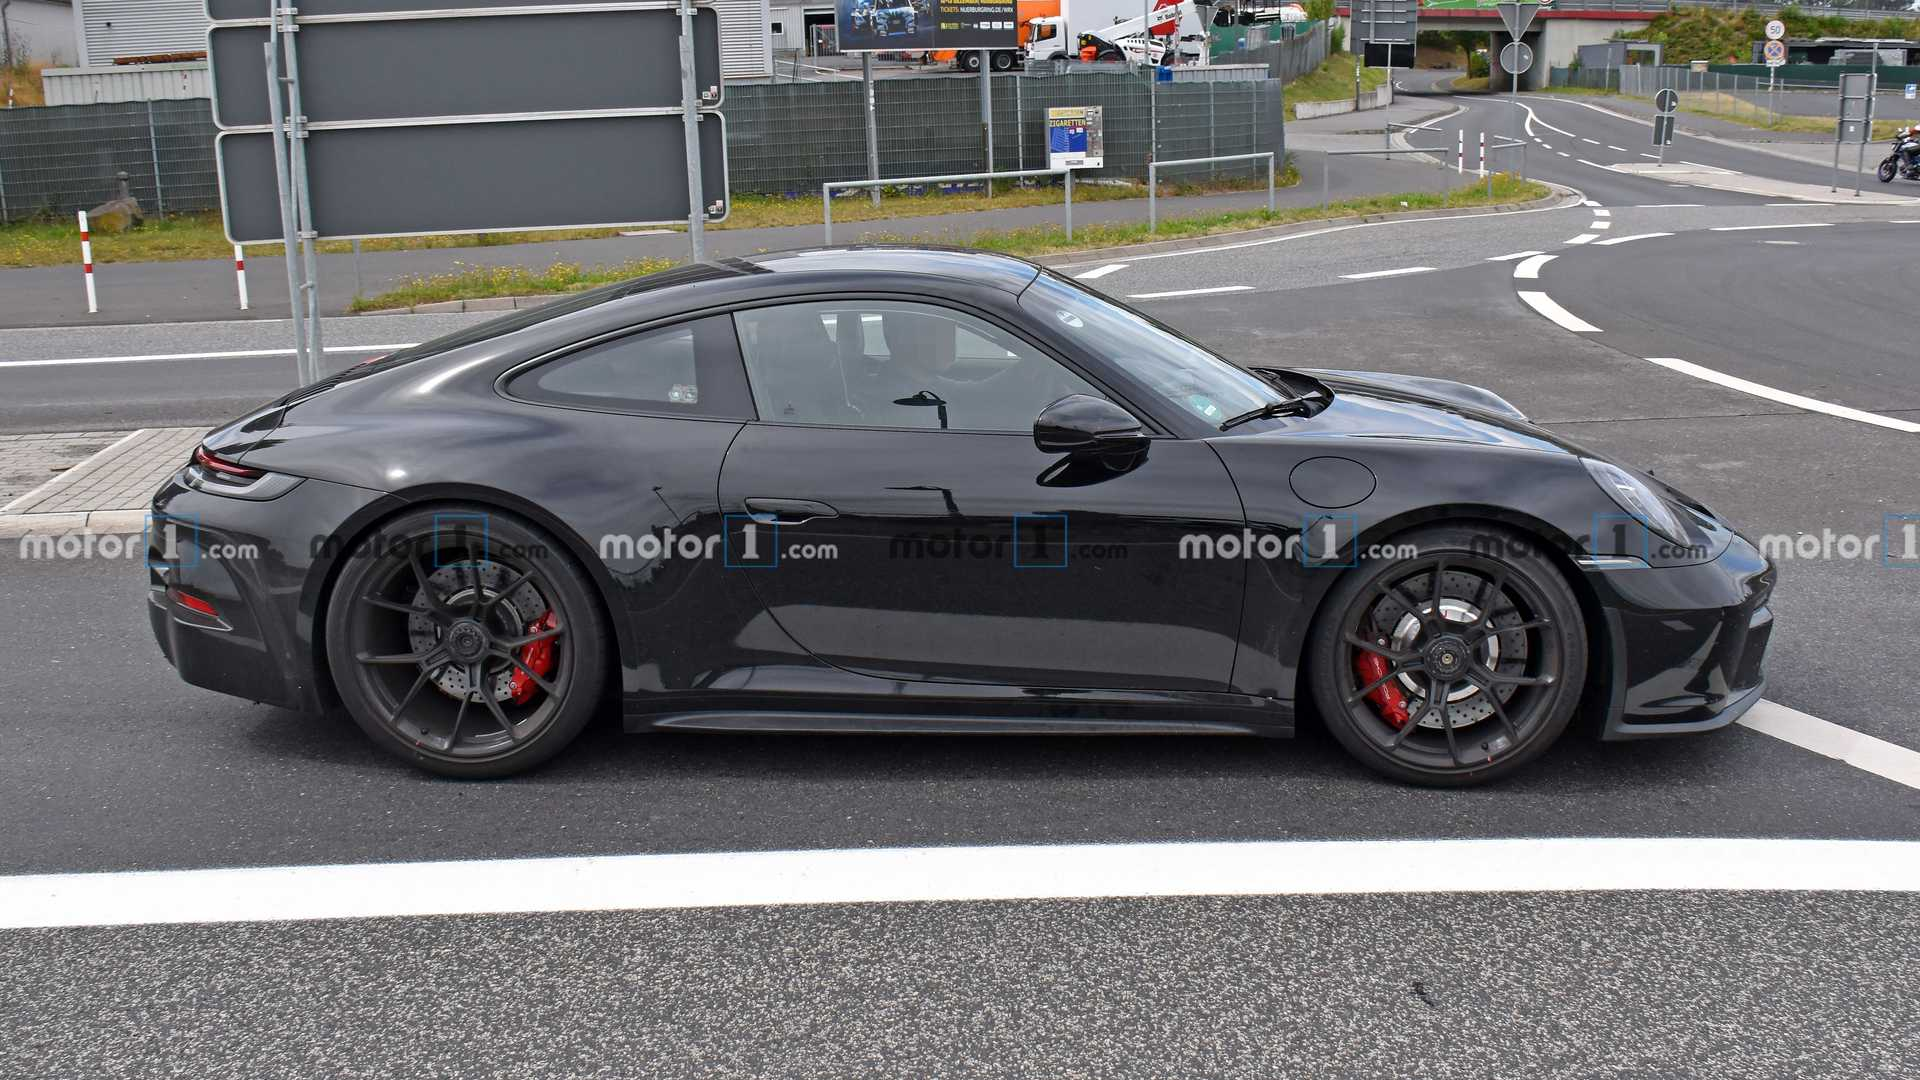 DS设计-保时捷911 GT3 Touring路试实拍图曝光